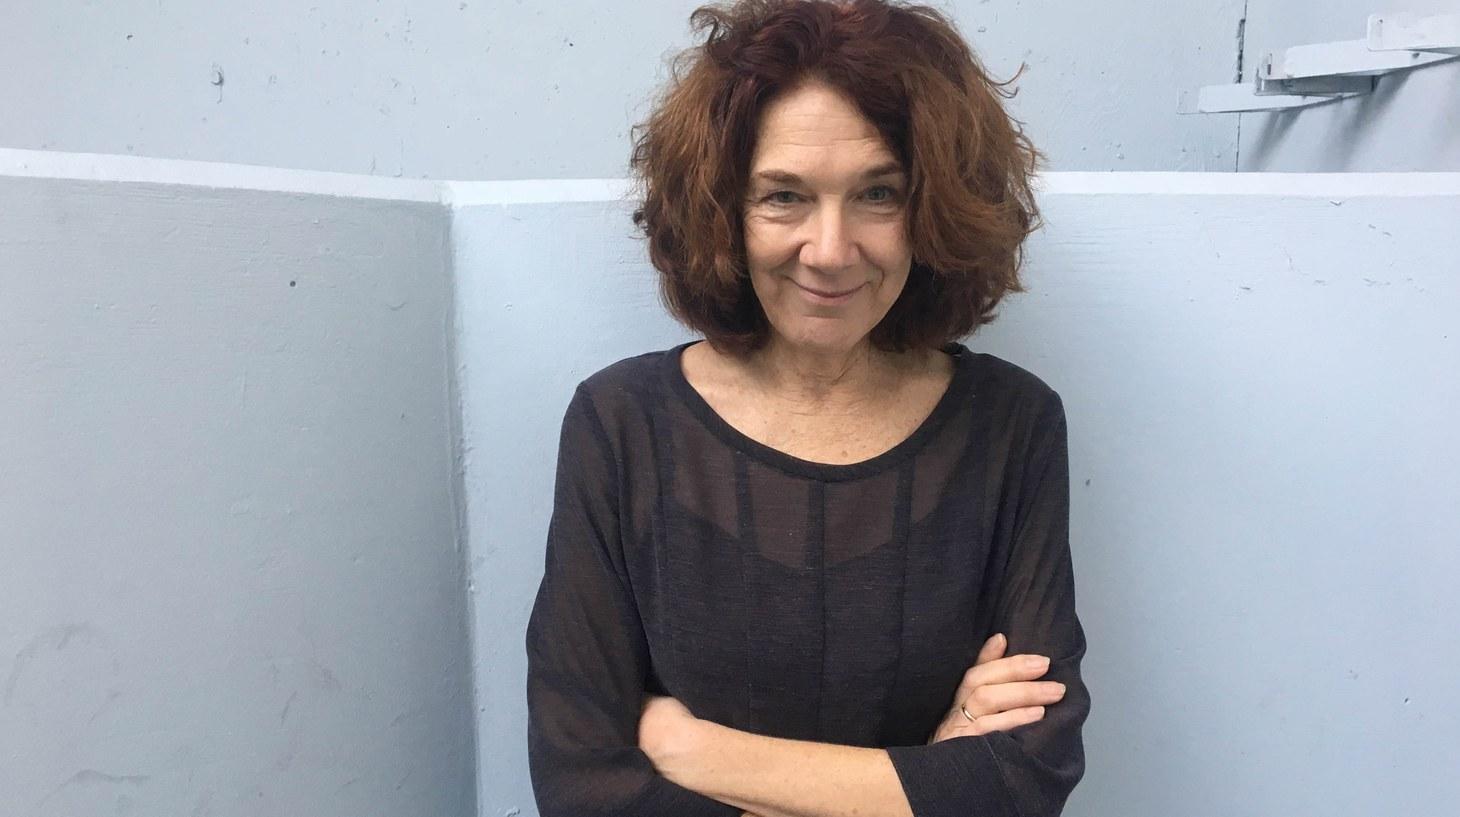 Author, Mary Ruefle